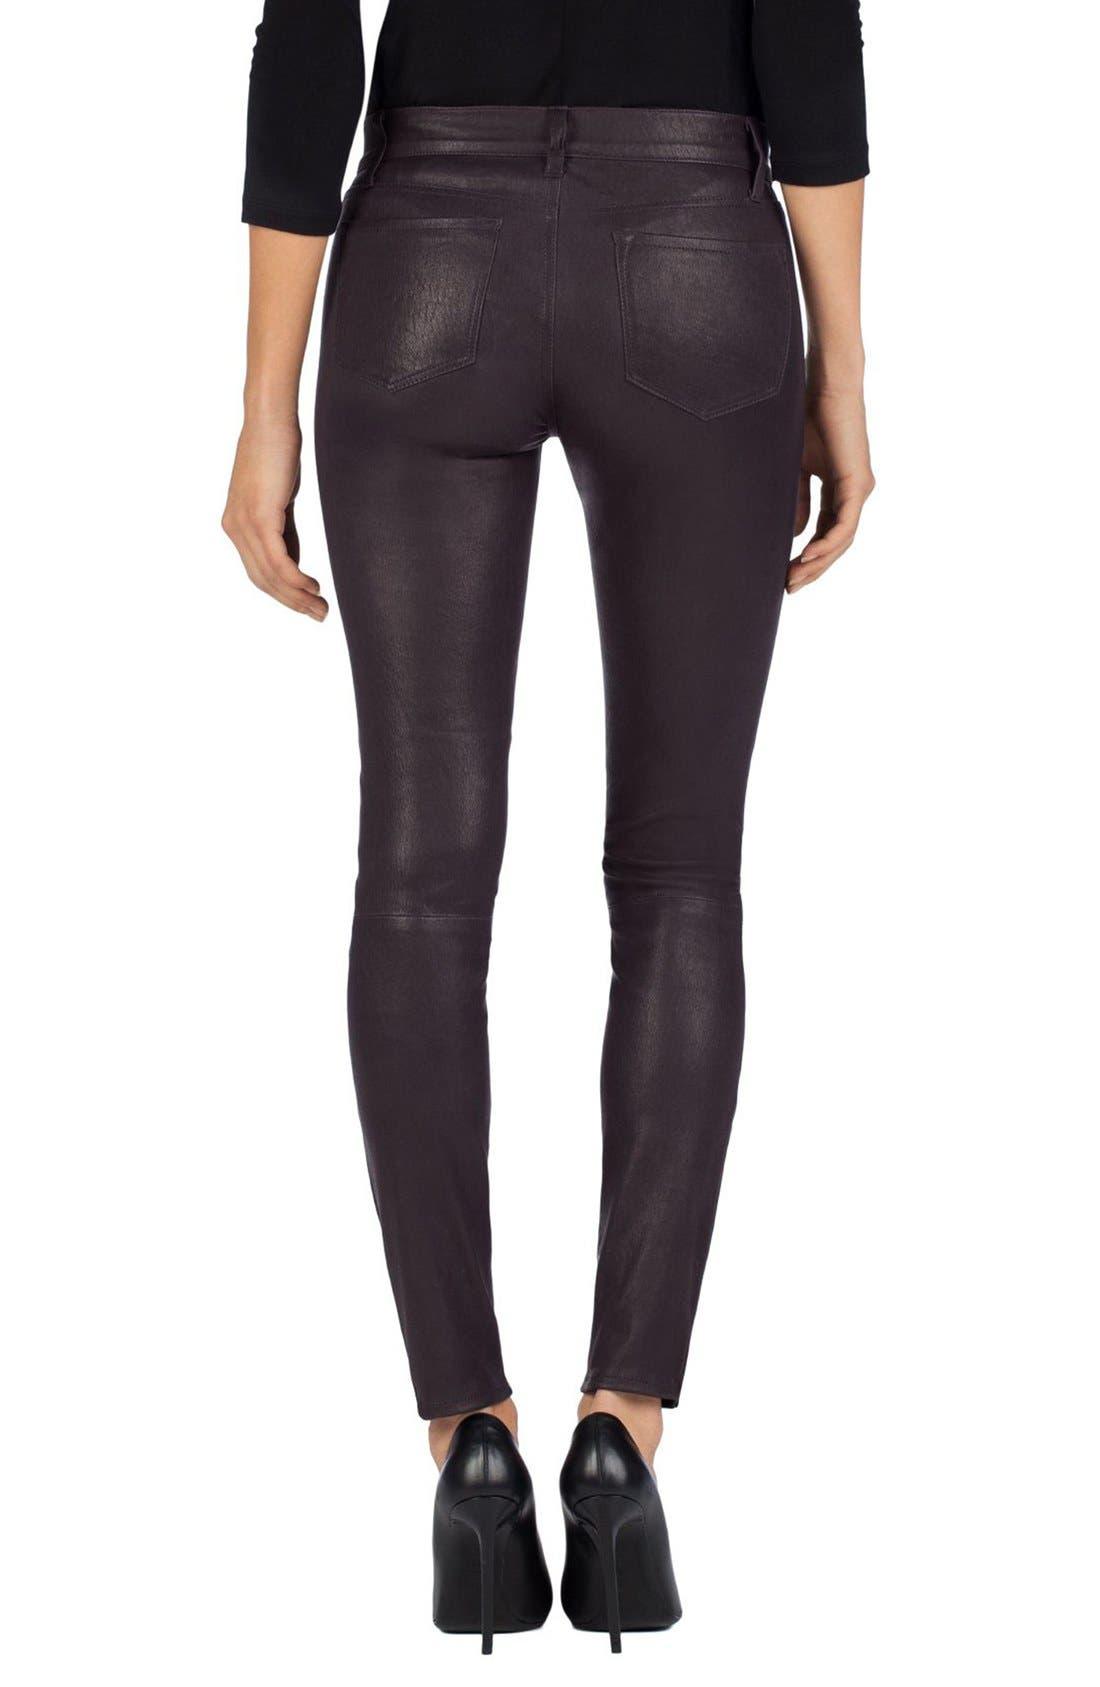 '8001' Lambskin Leather Pants,                             Alternate thumbnail 39, color,